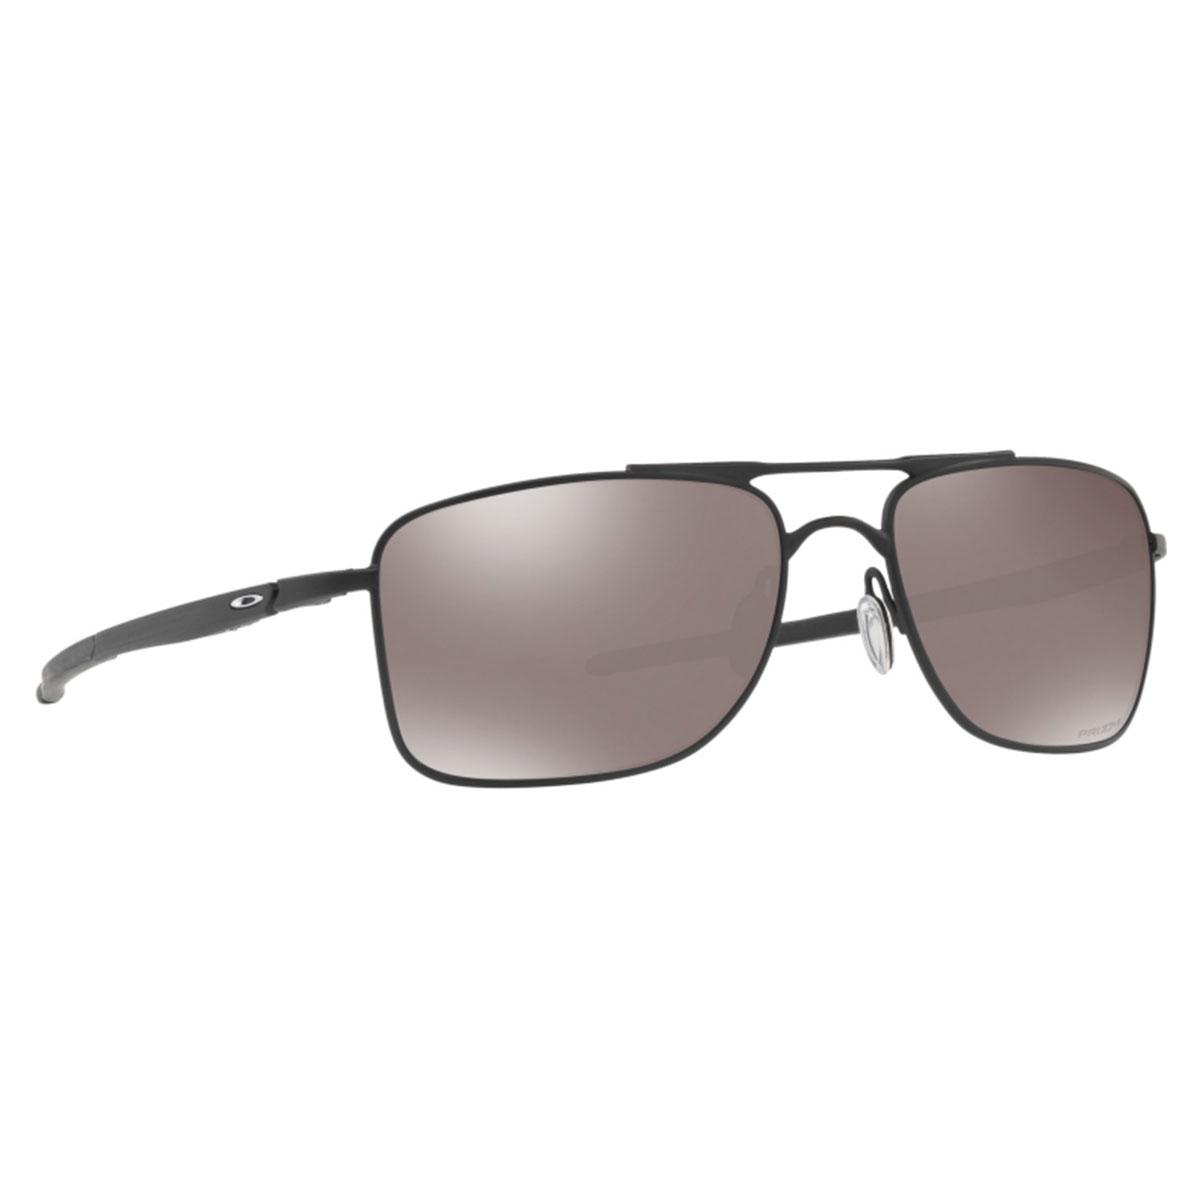 352231461ef8 Oakley Sport Gauge 8 Sunglasses - Matte Black Prizm Black Polarized